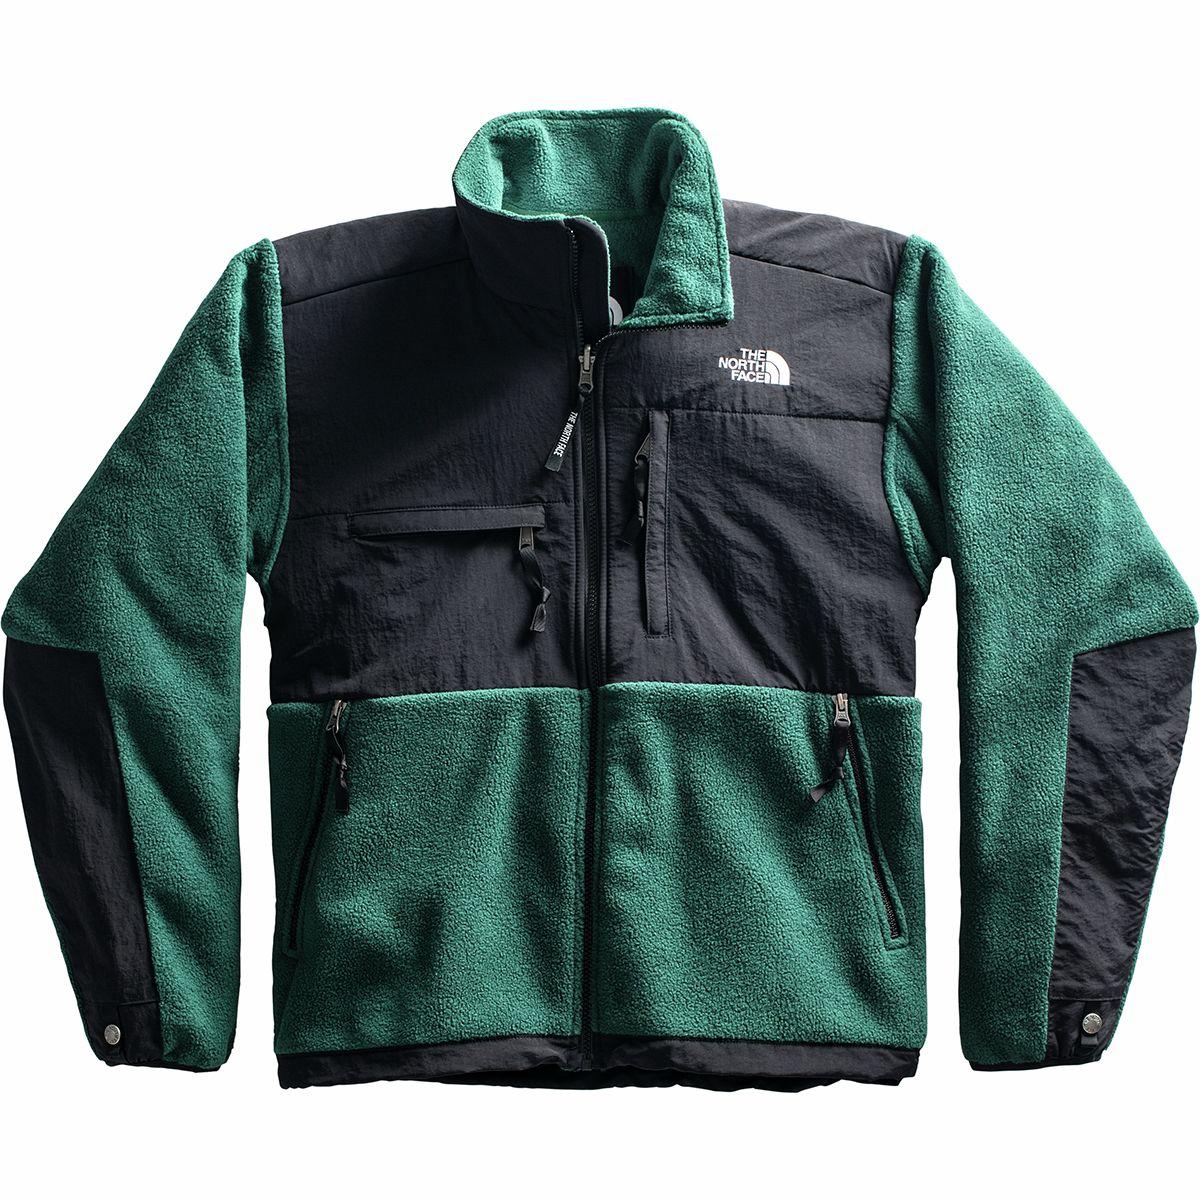 95 Retro Denali Jacket - Men